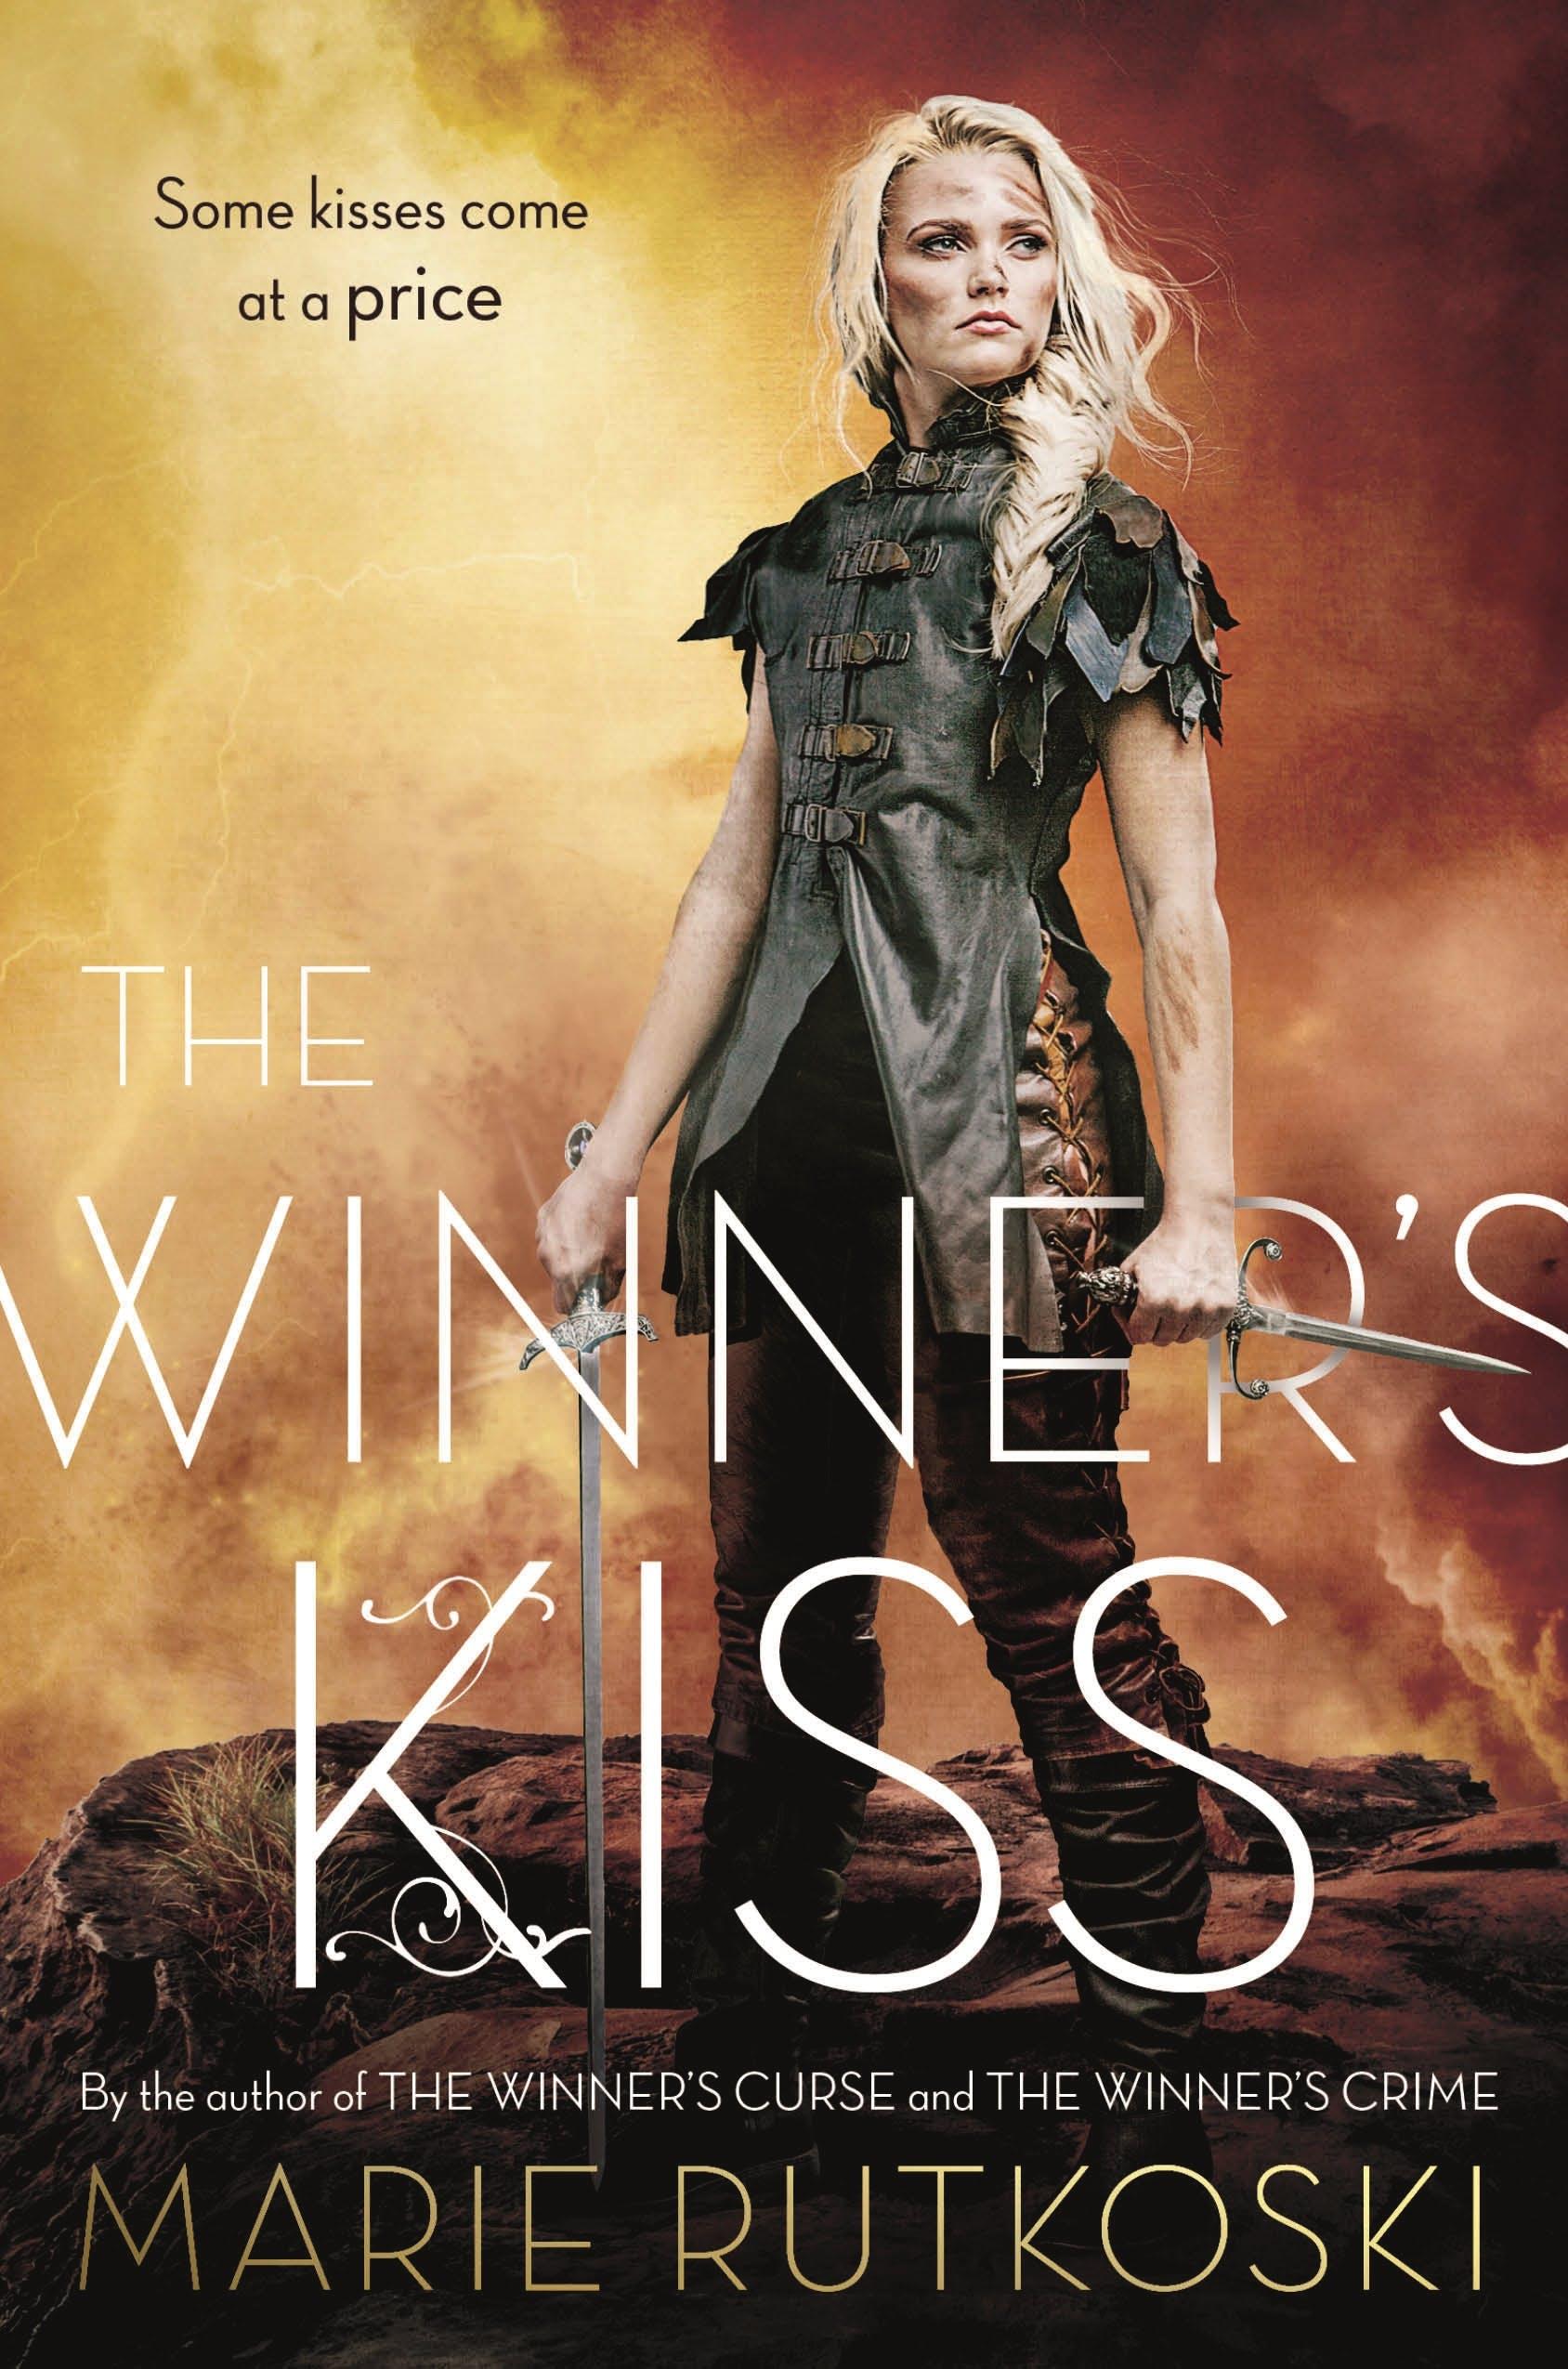 Image of The Winner's Kiss